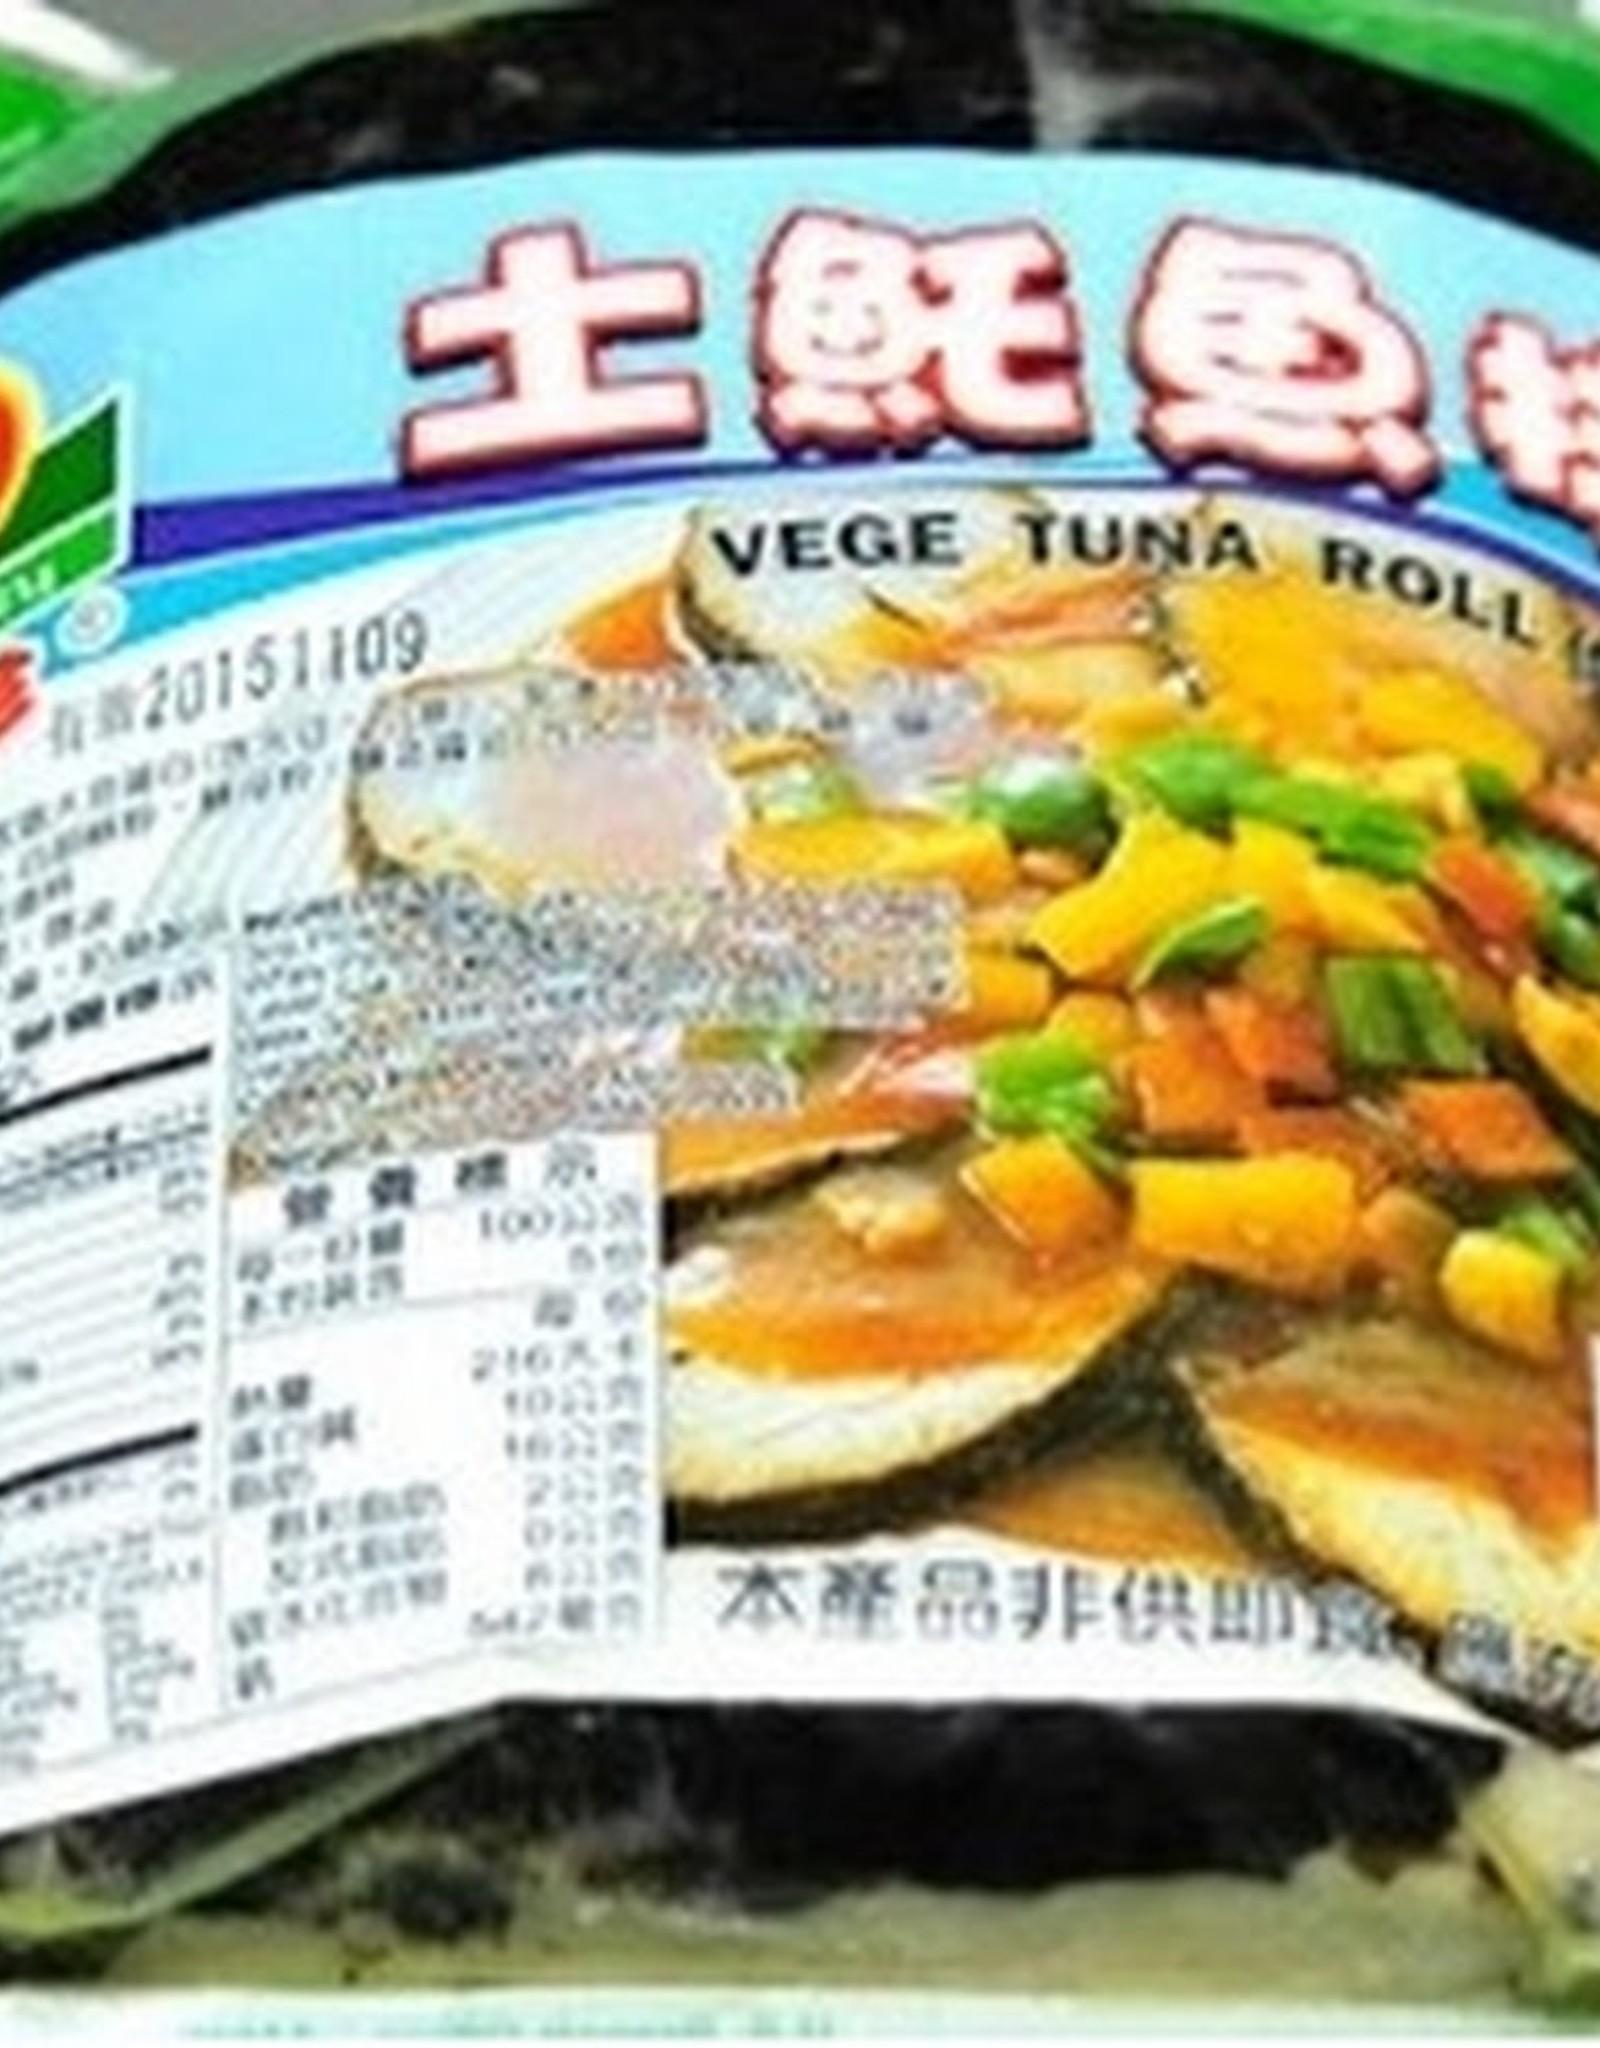 Vegefarm * 松珍 (VF) Vege Sliced Tuna Roll*(松珍) 素土魠魚排 (S)